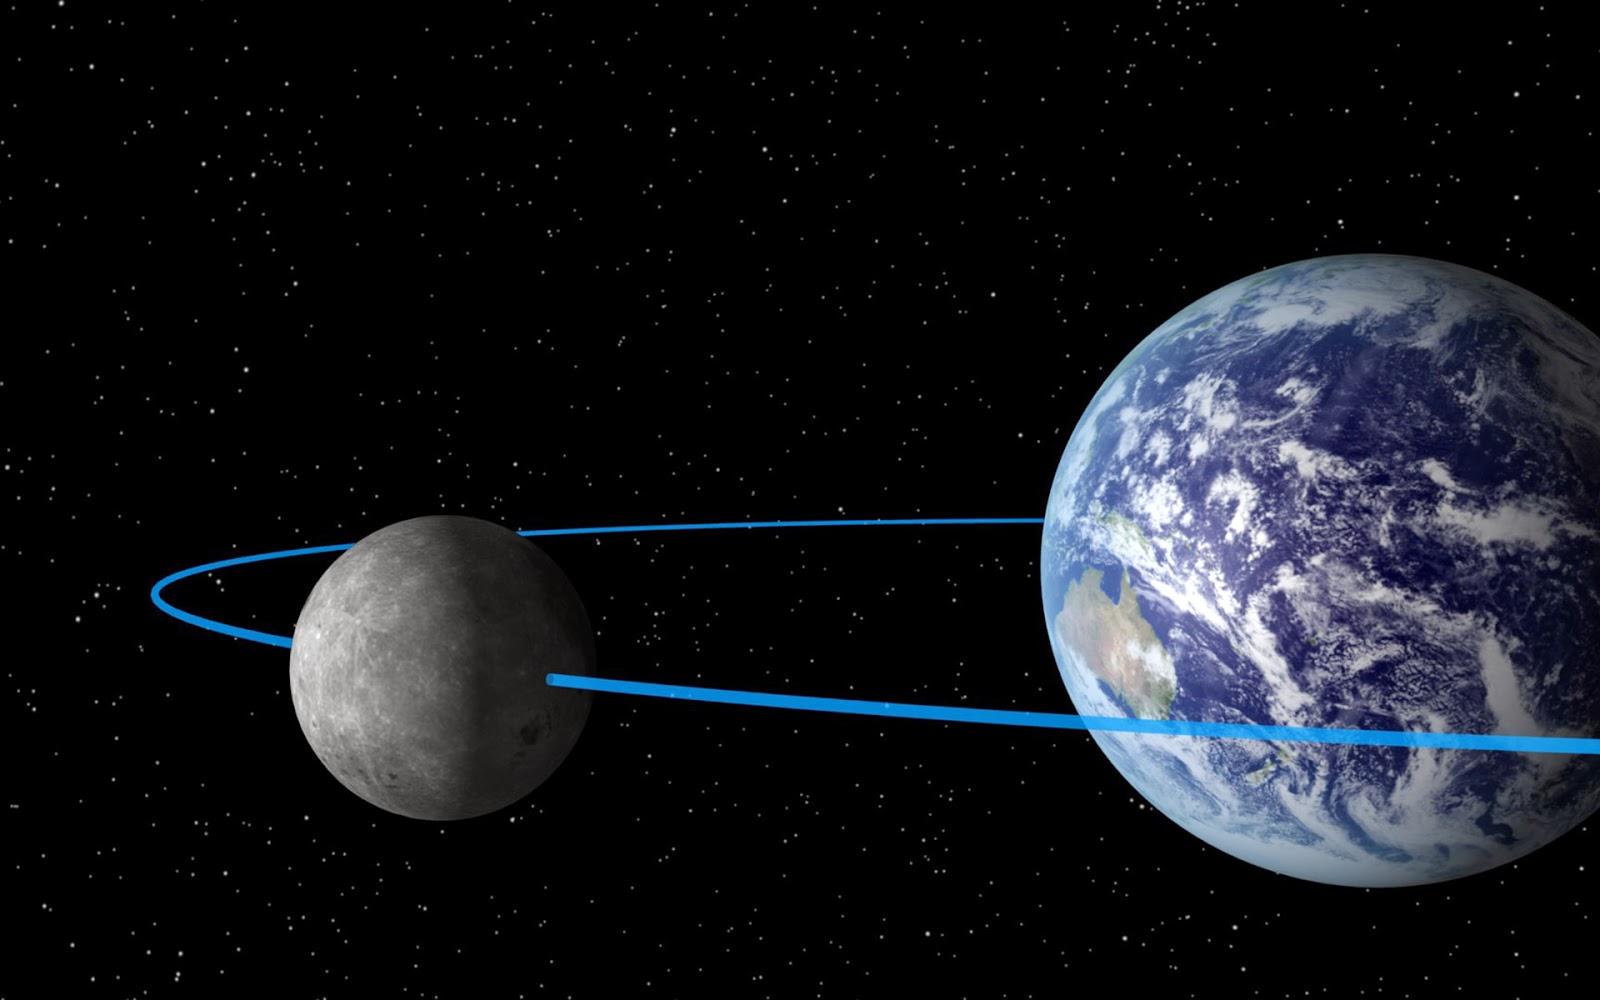 http://3.bp.blogspot.com/-rU-YUGis4tU/VTVA9g1fPAI/AAAAAAAAAII/9pX4fPH8rwM/s1600/moon-earth.jpg